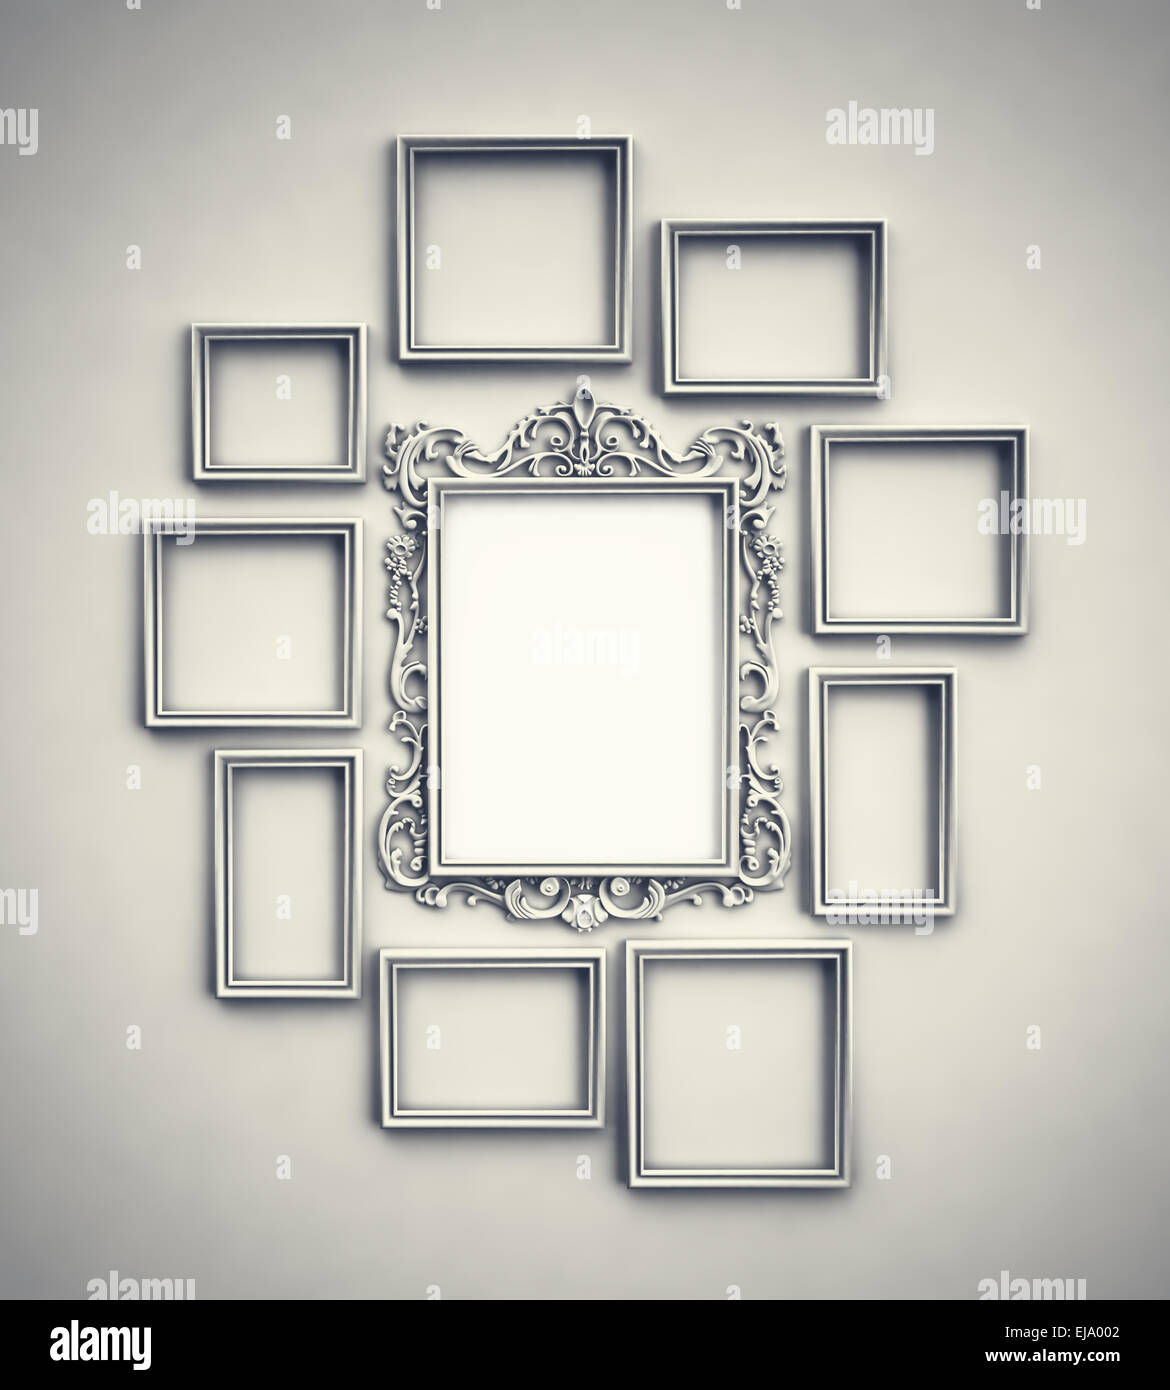 Photo Frames Wall Stockfotos & Photo Frames Wall Bilder - Alamy